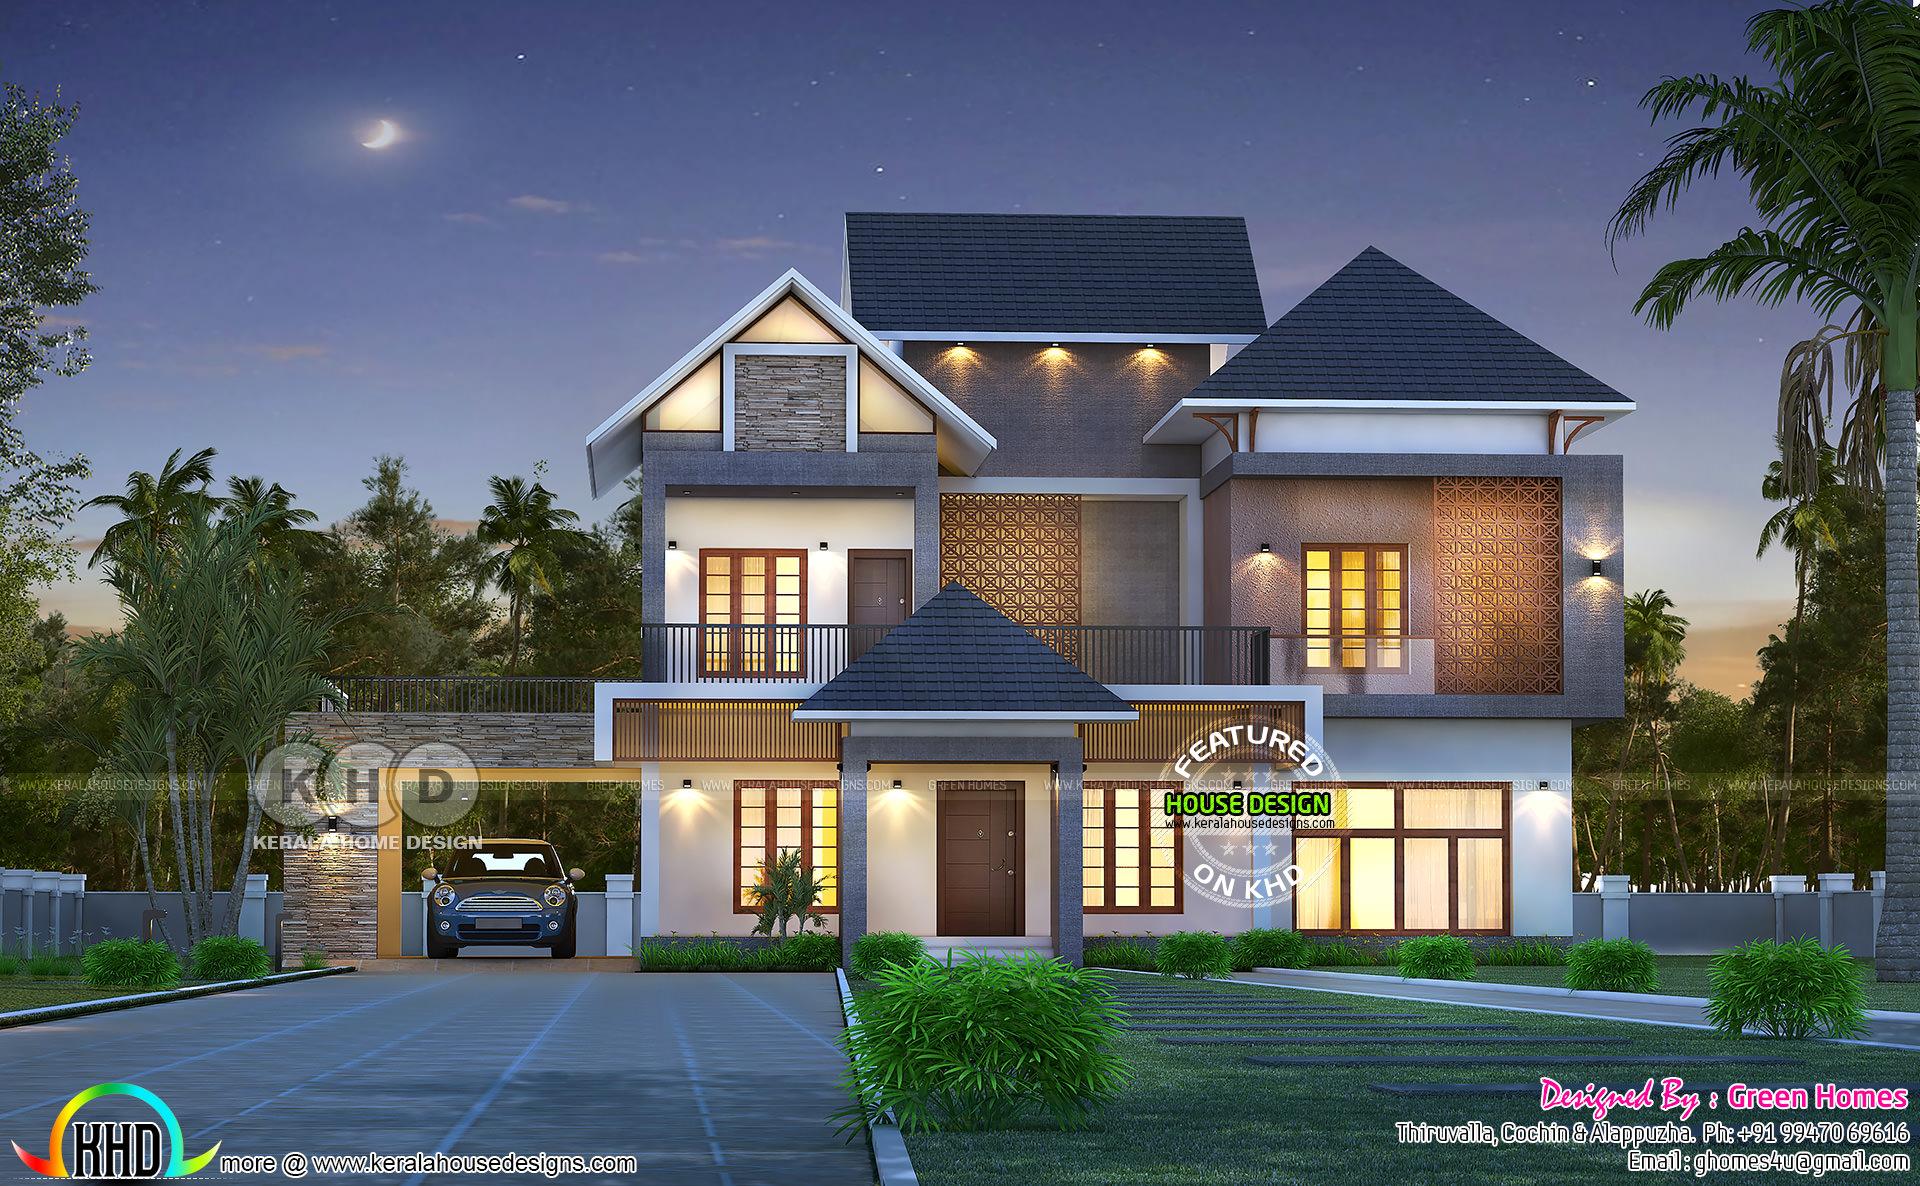 February 2020 House Designs Grand Kerala Home Design Kerala Home Design And Floor Plans 8000 Houses